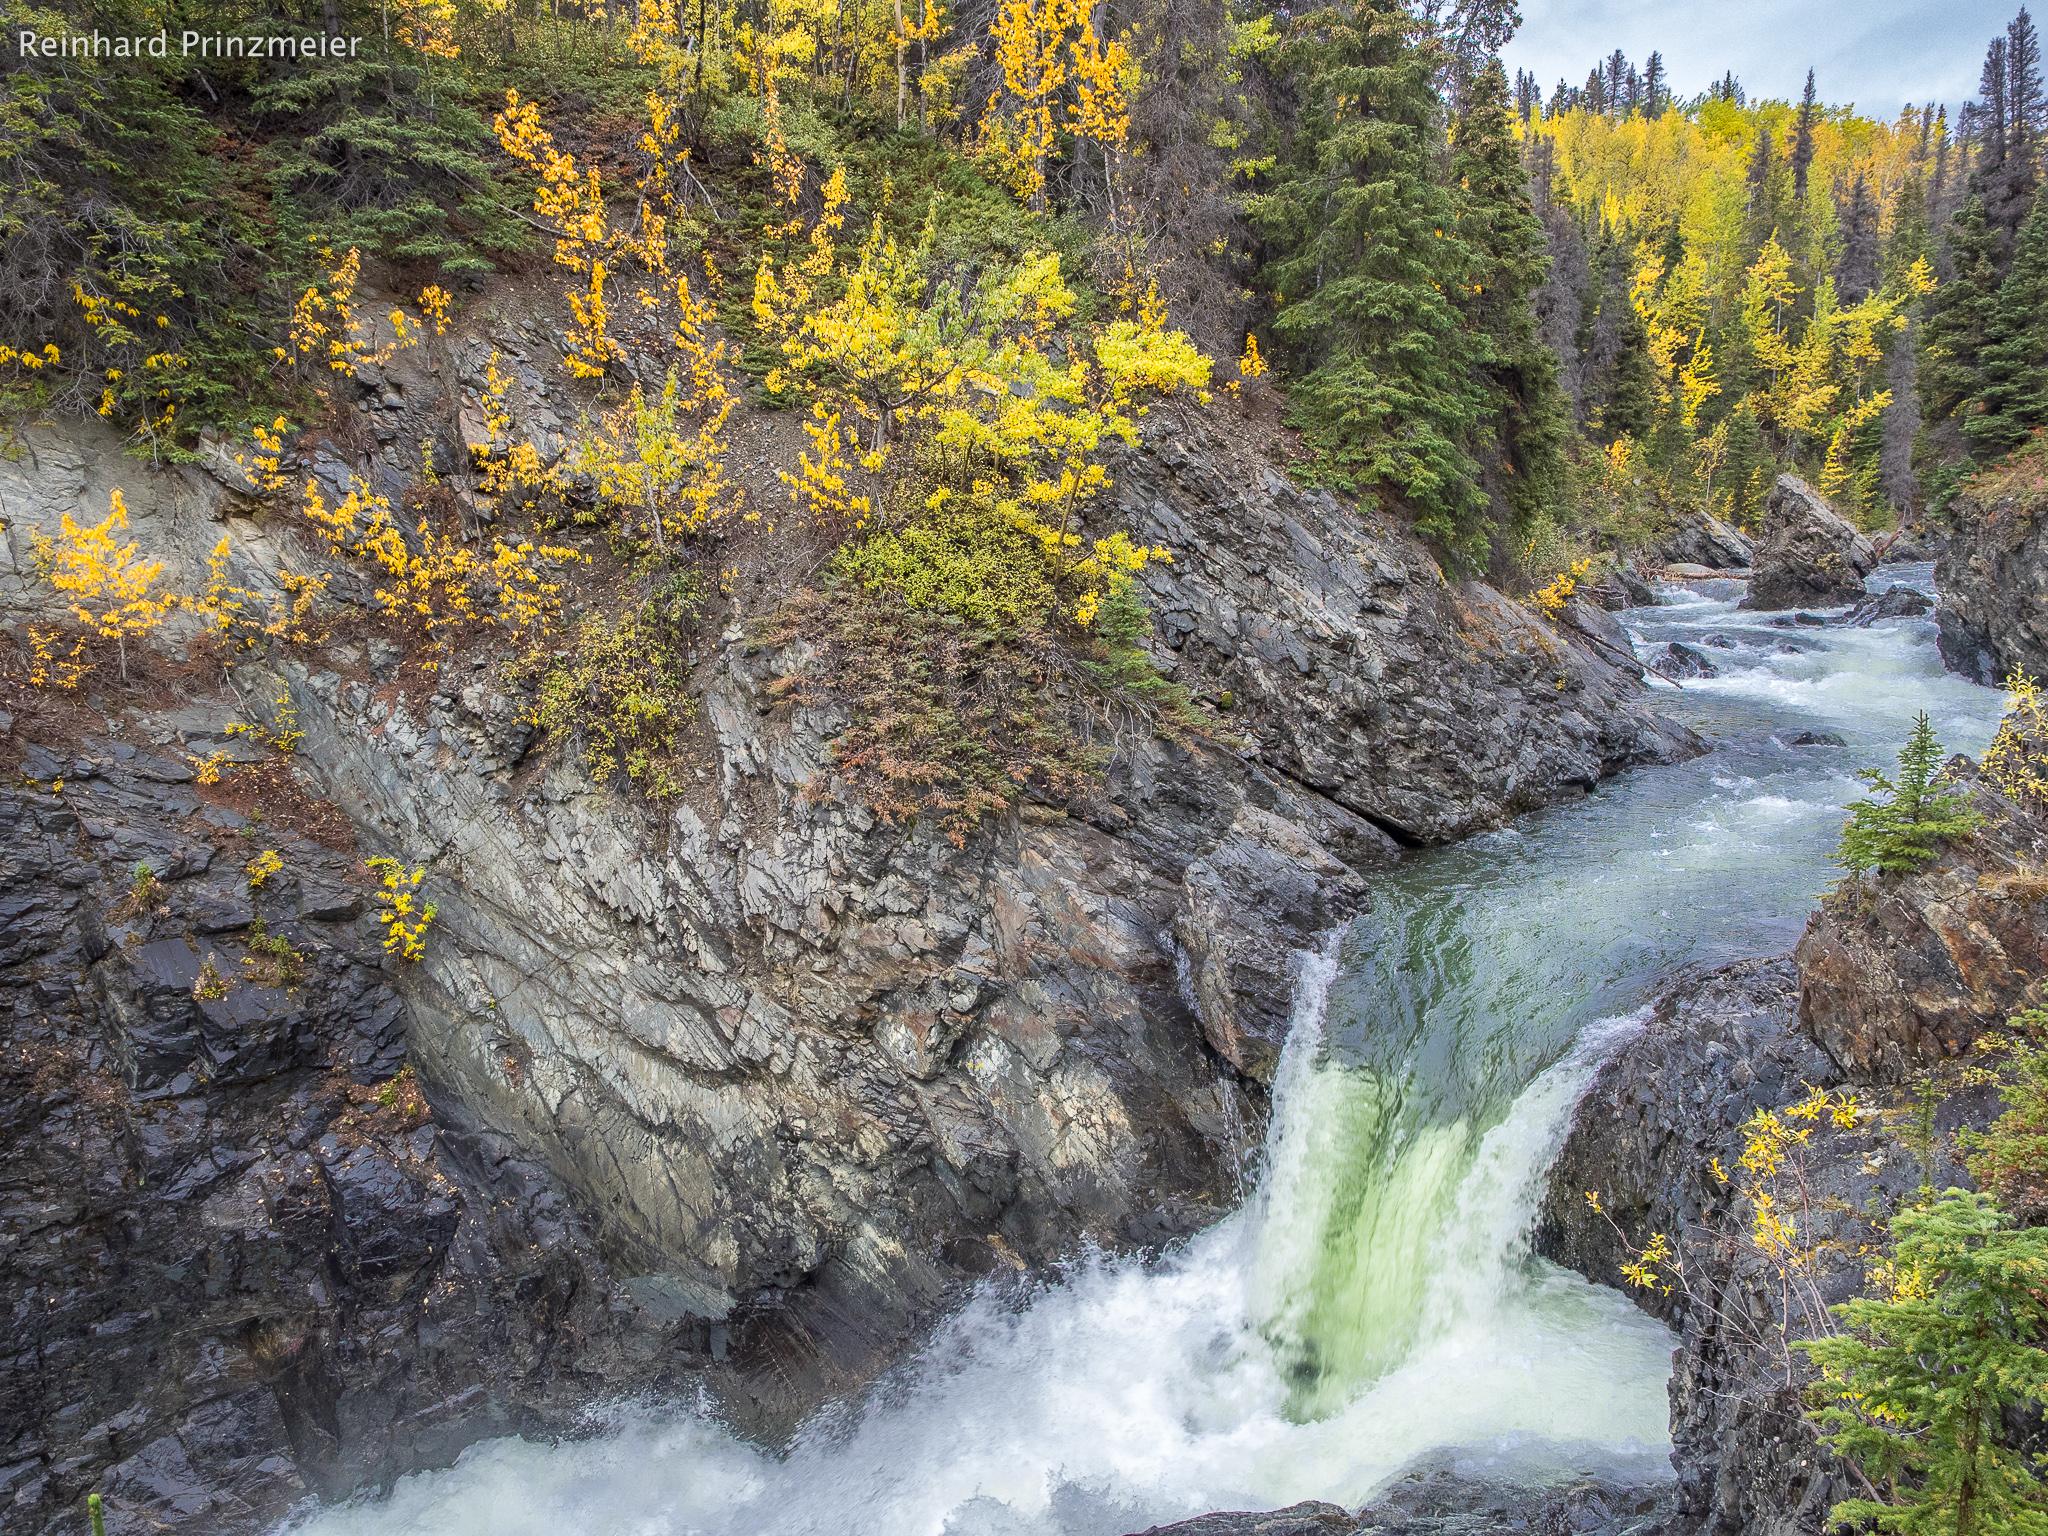 Million Dollar Falls, Canada